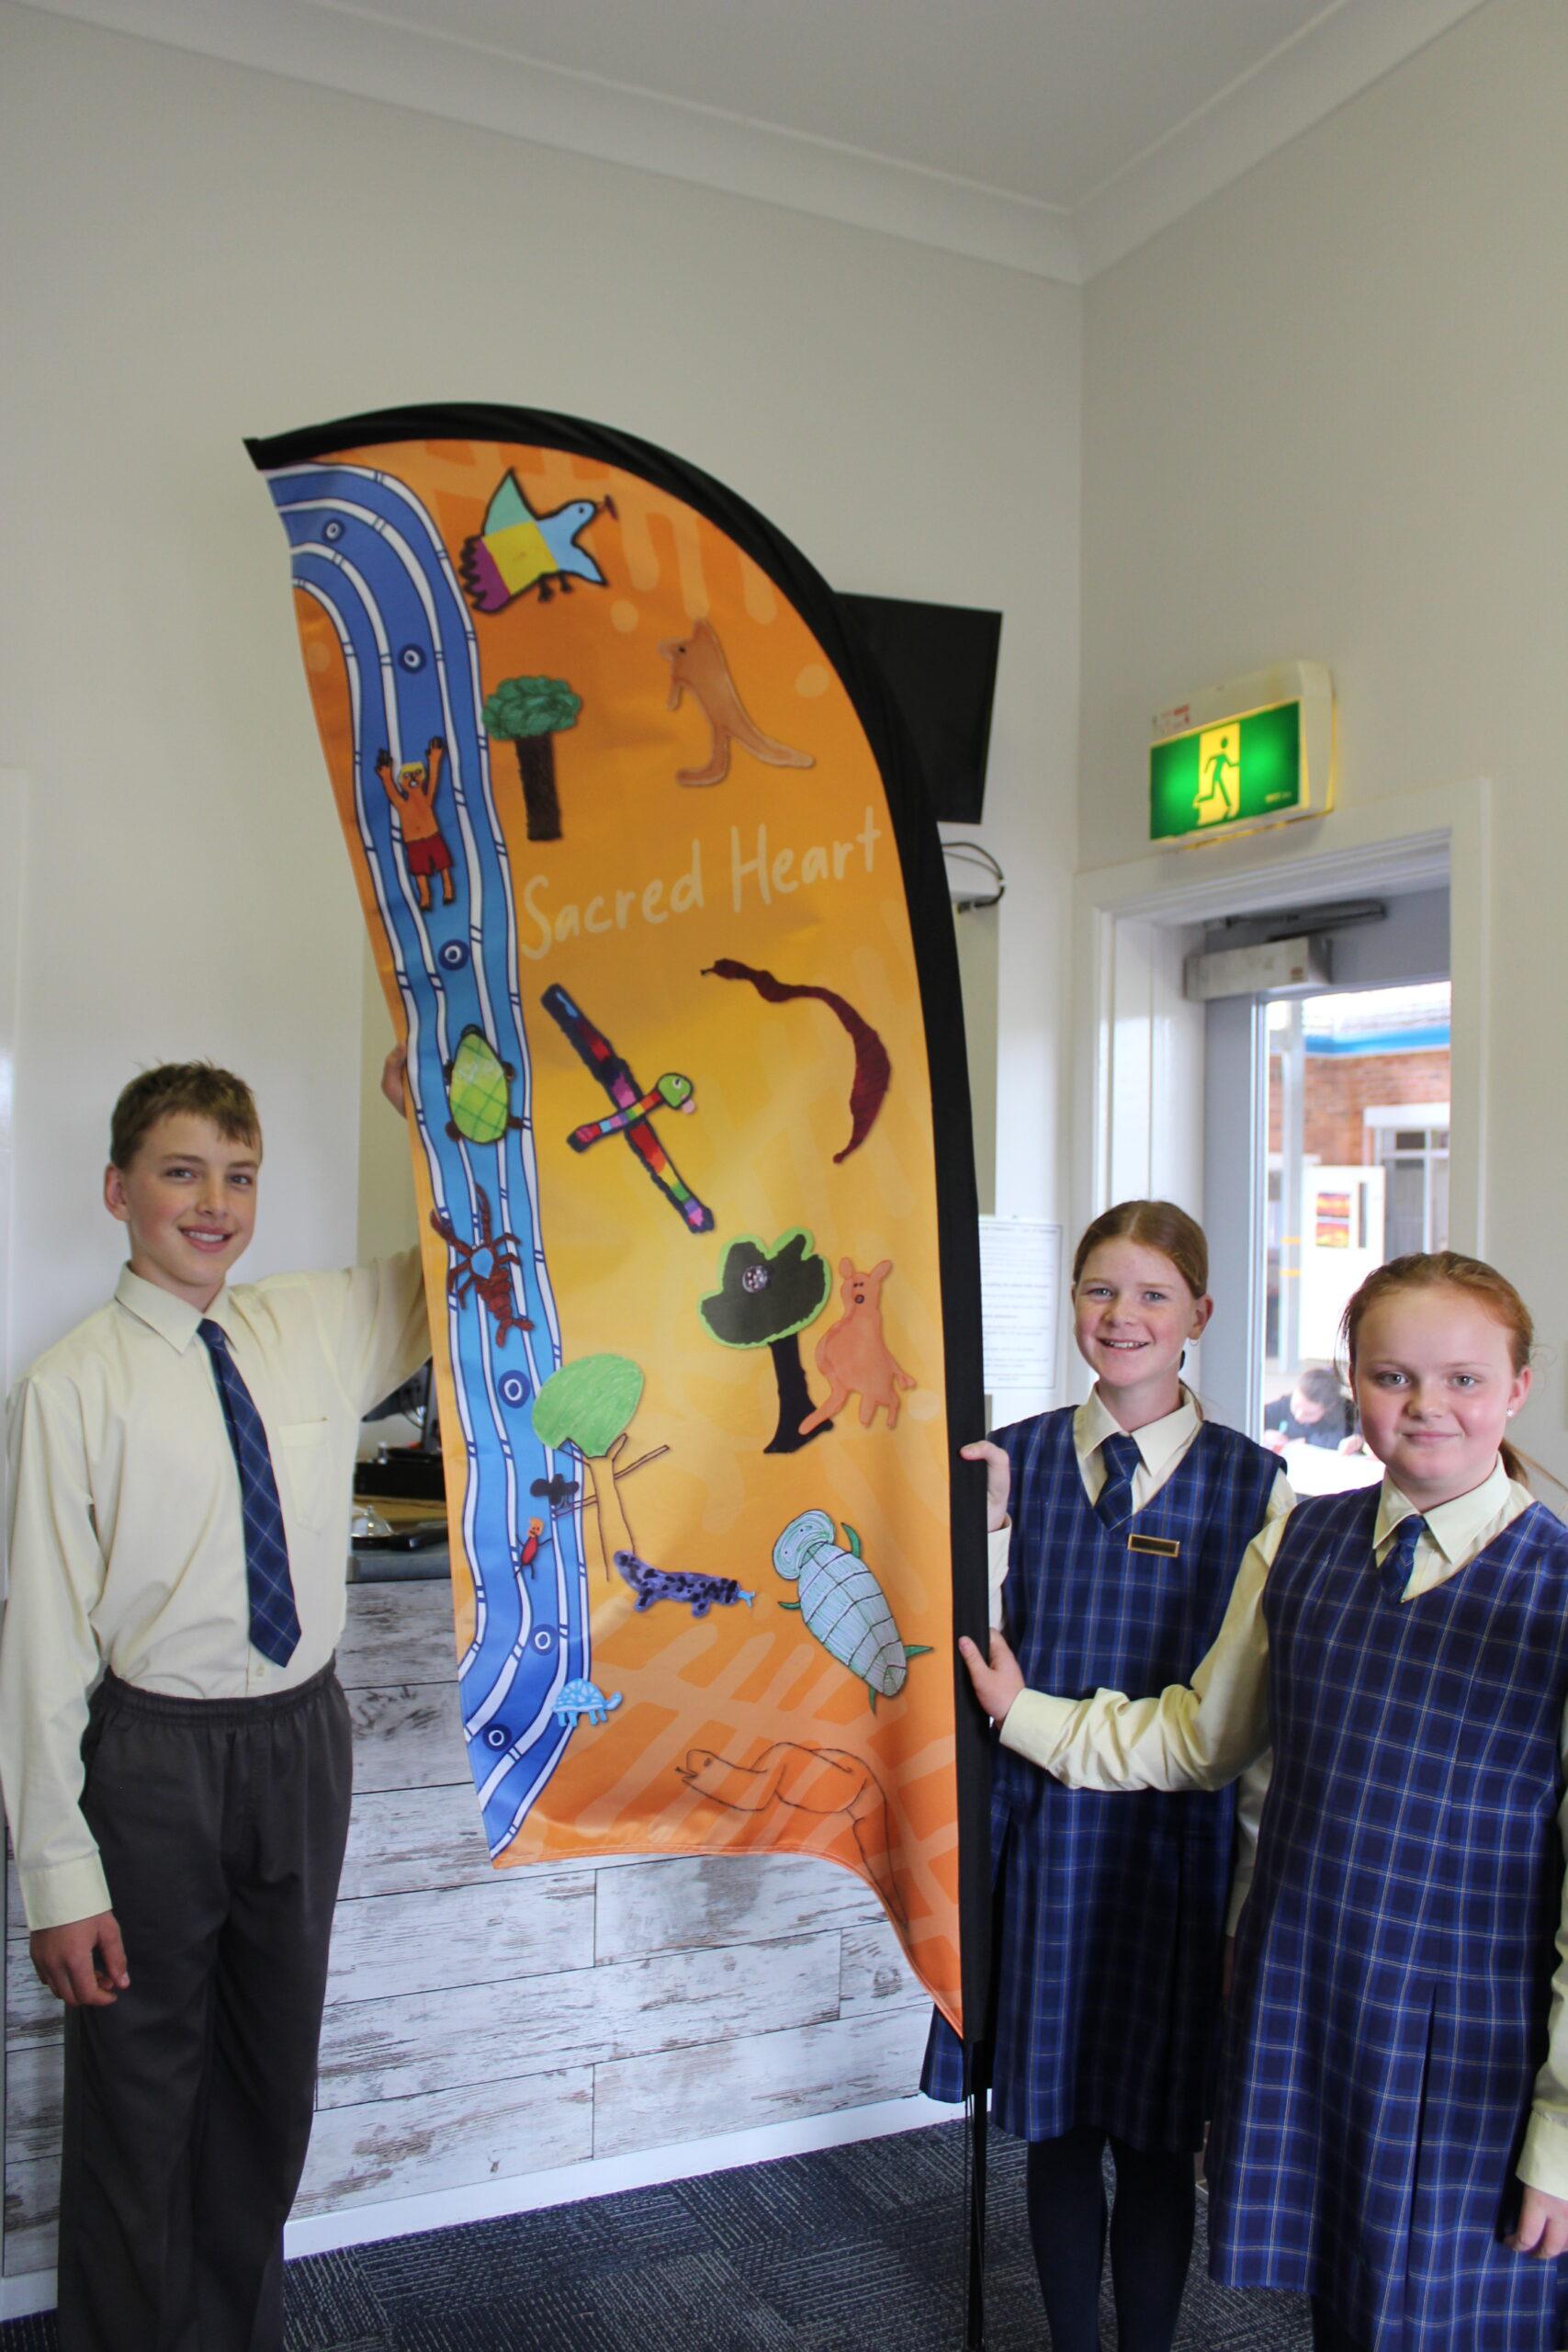 Proudly displaying their school banner, Jack Rees, Hallie Thomson and Tori Whelan.